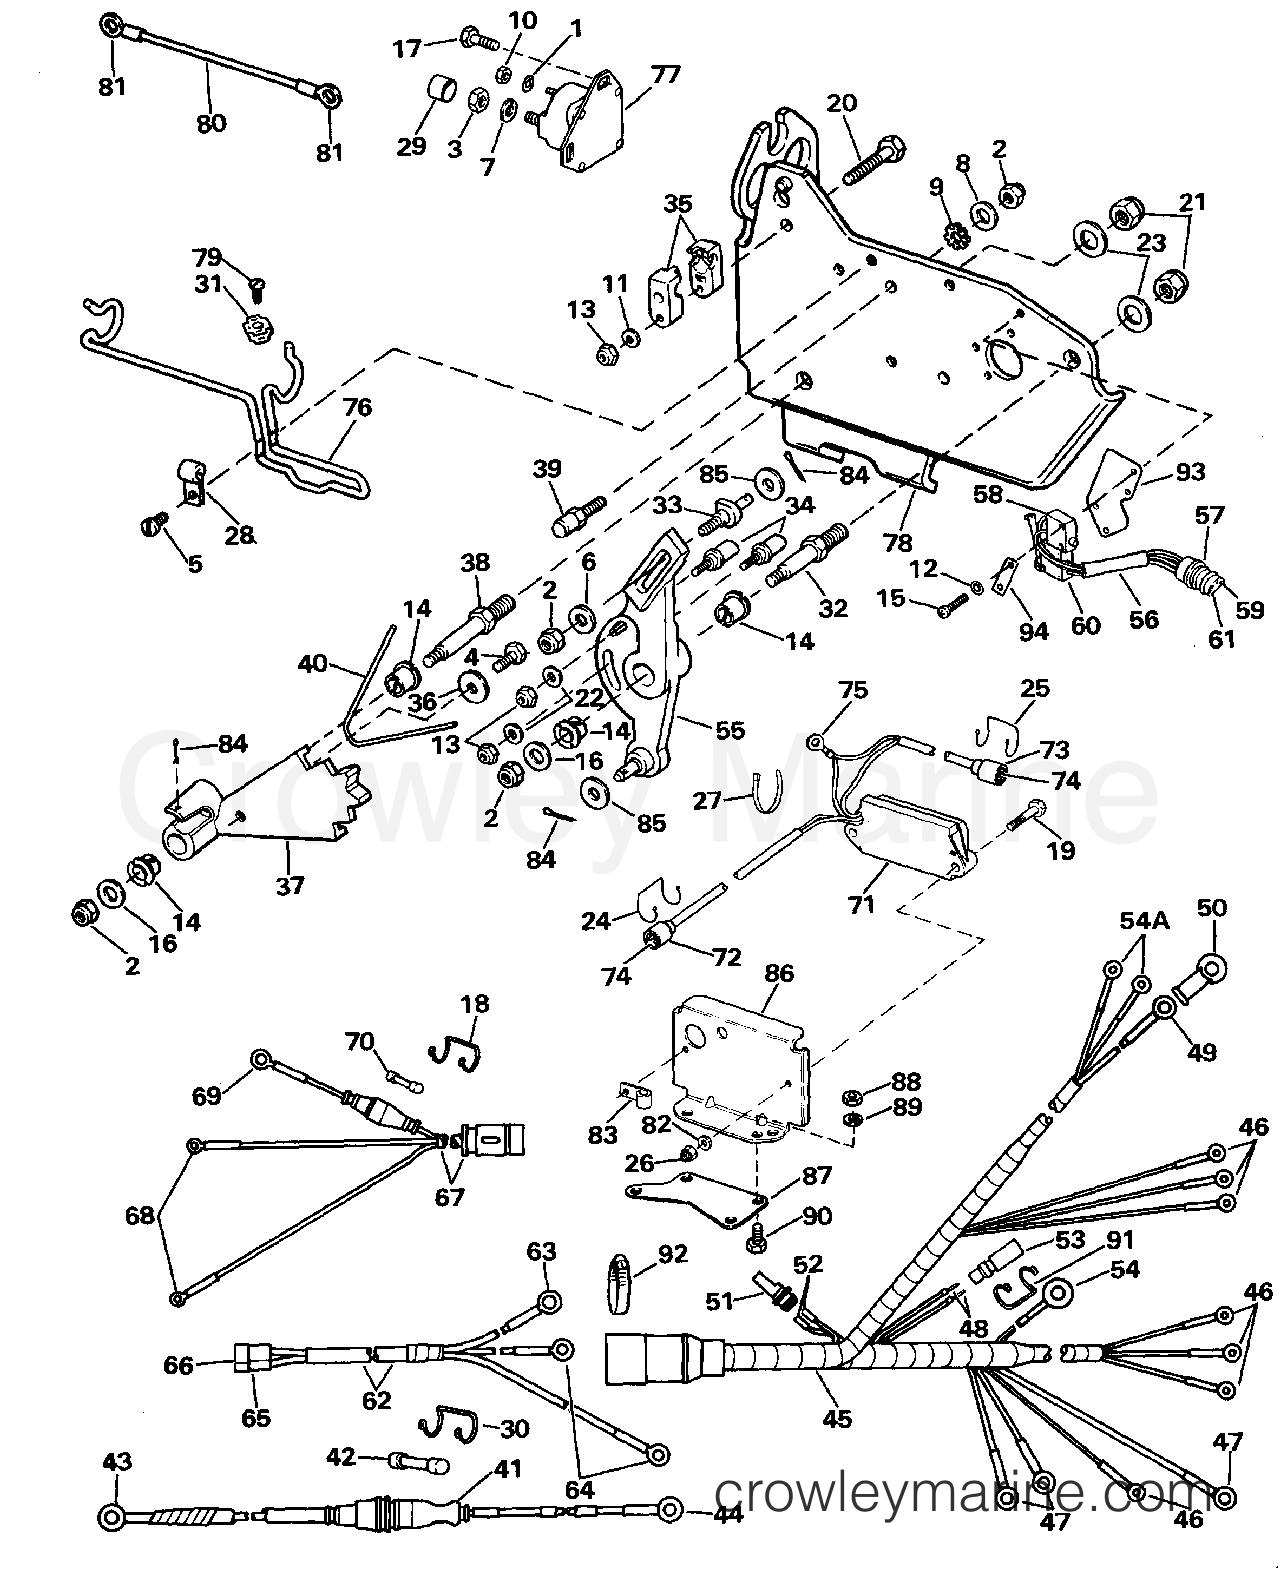 Wire Harness, Bracket & Solenoid 1988 Omc Stern Drive 2 3 1985 OMC Wiring Diagrams Omc 2.3 Wiring Diagram